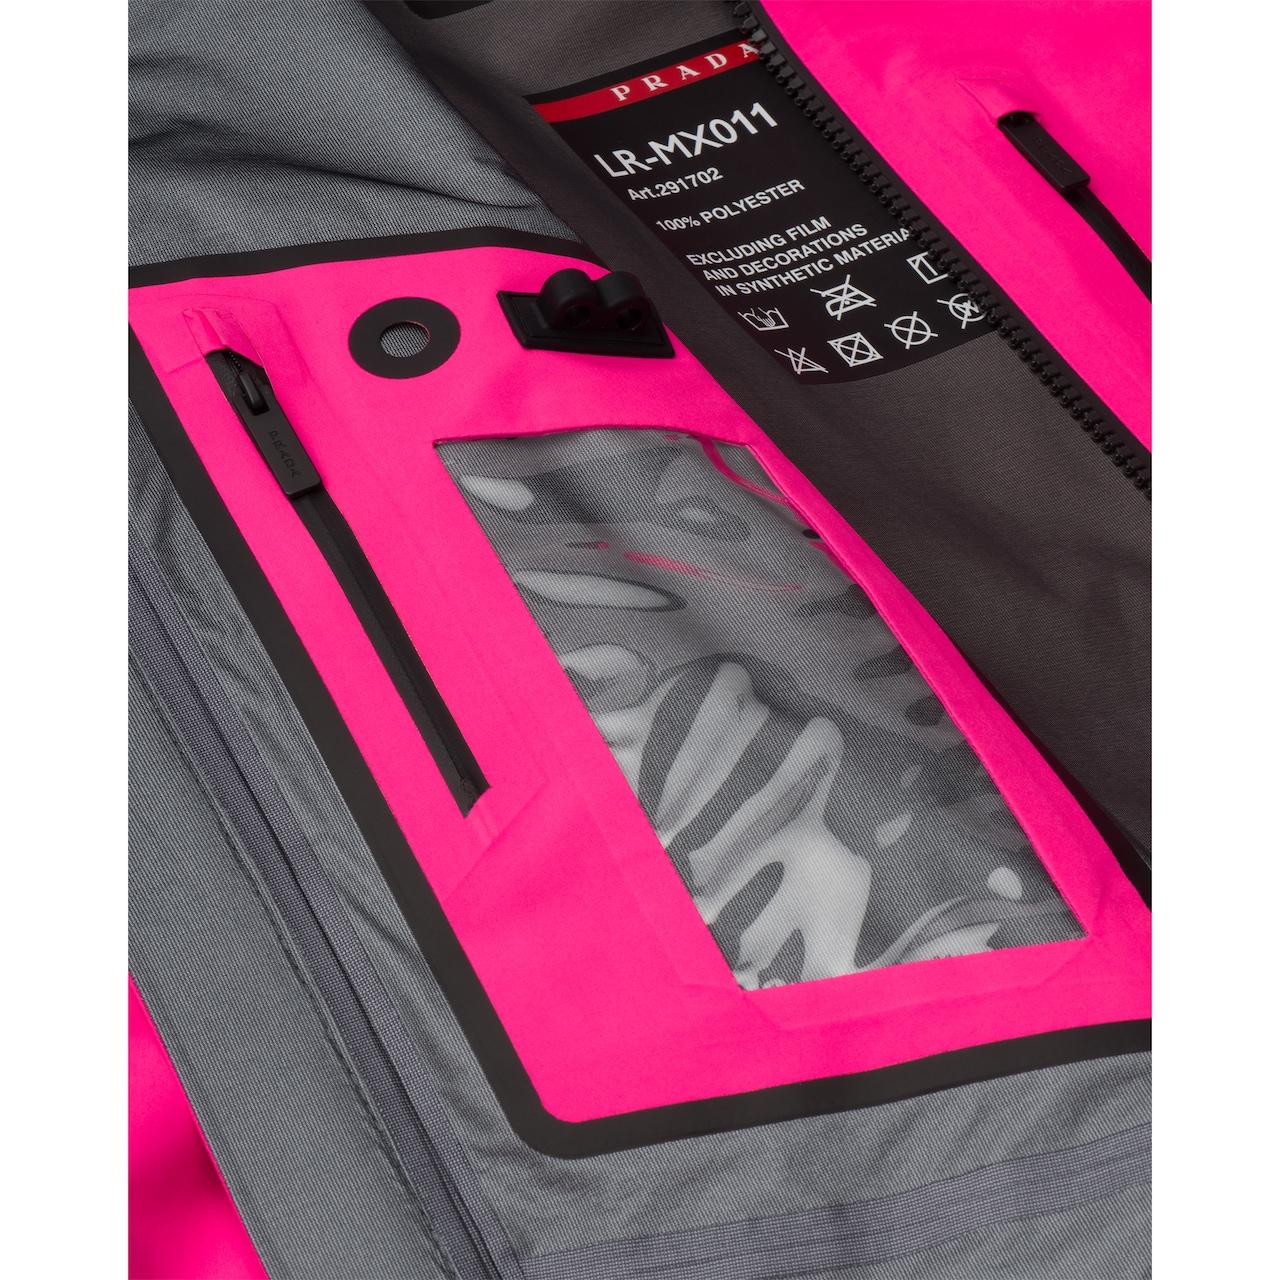 Prada LR-MX11 technical GORE-TEX nylon fabric blouson jacket 6